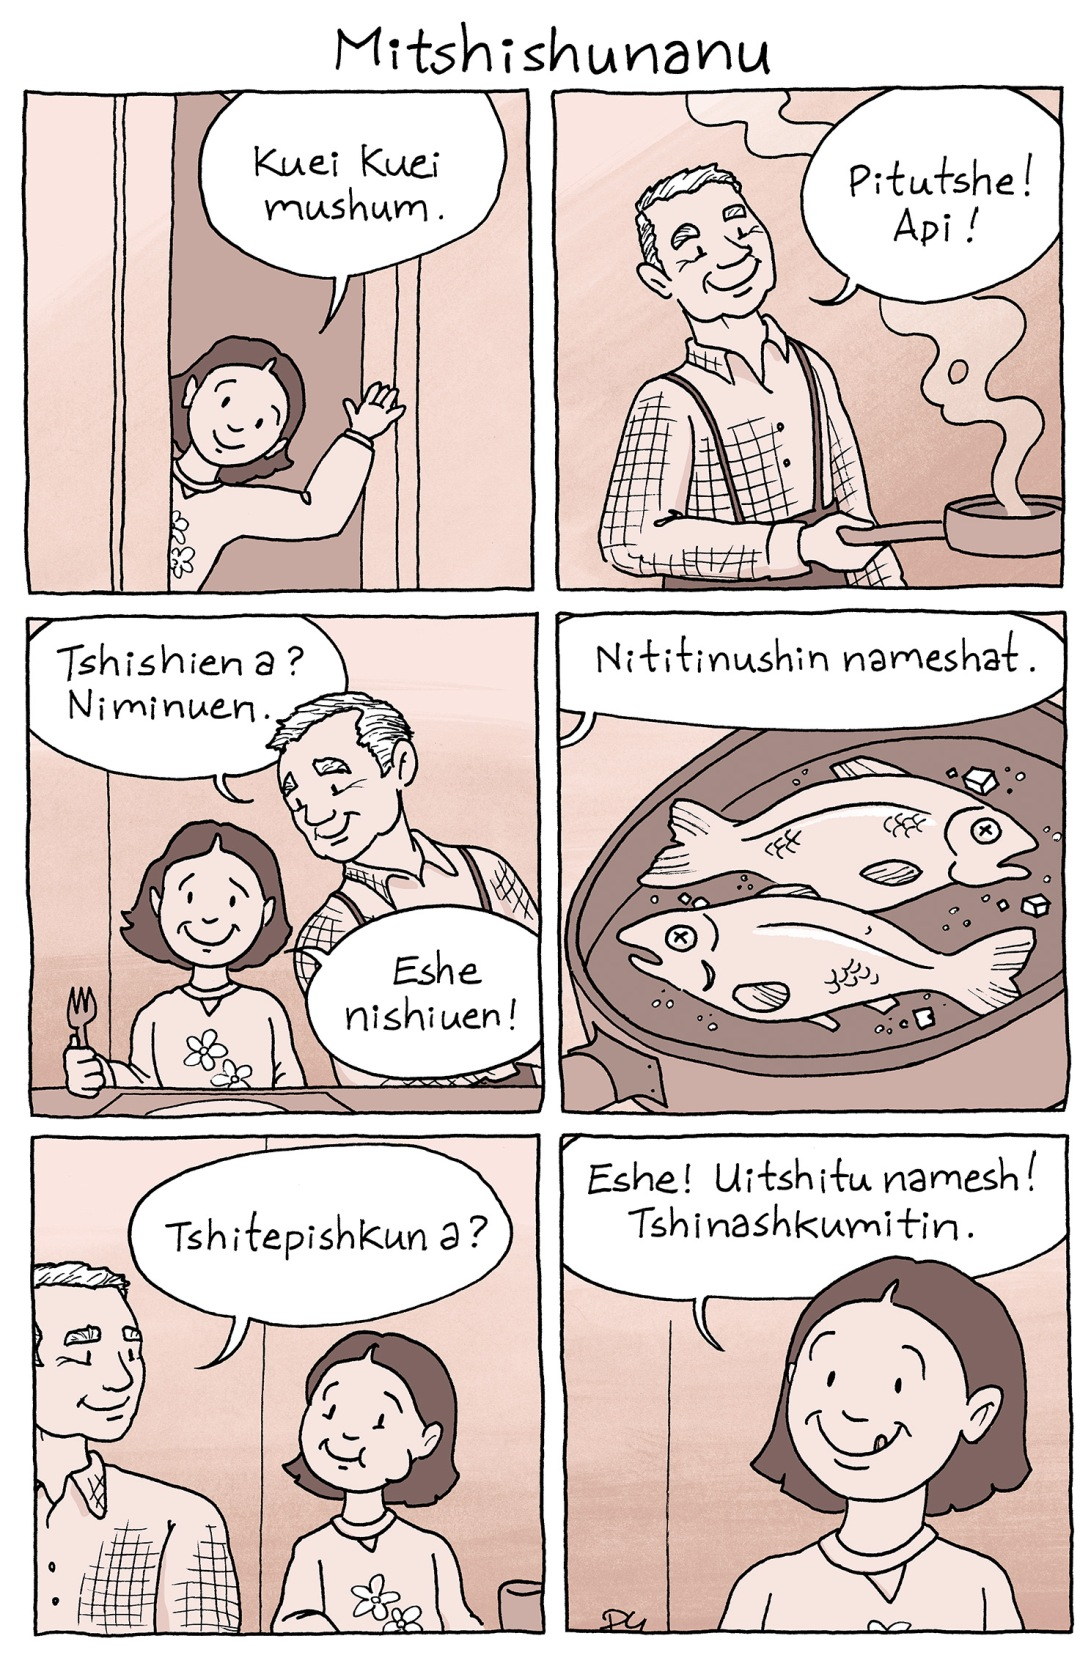 Mitshishunanu : le repas